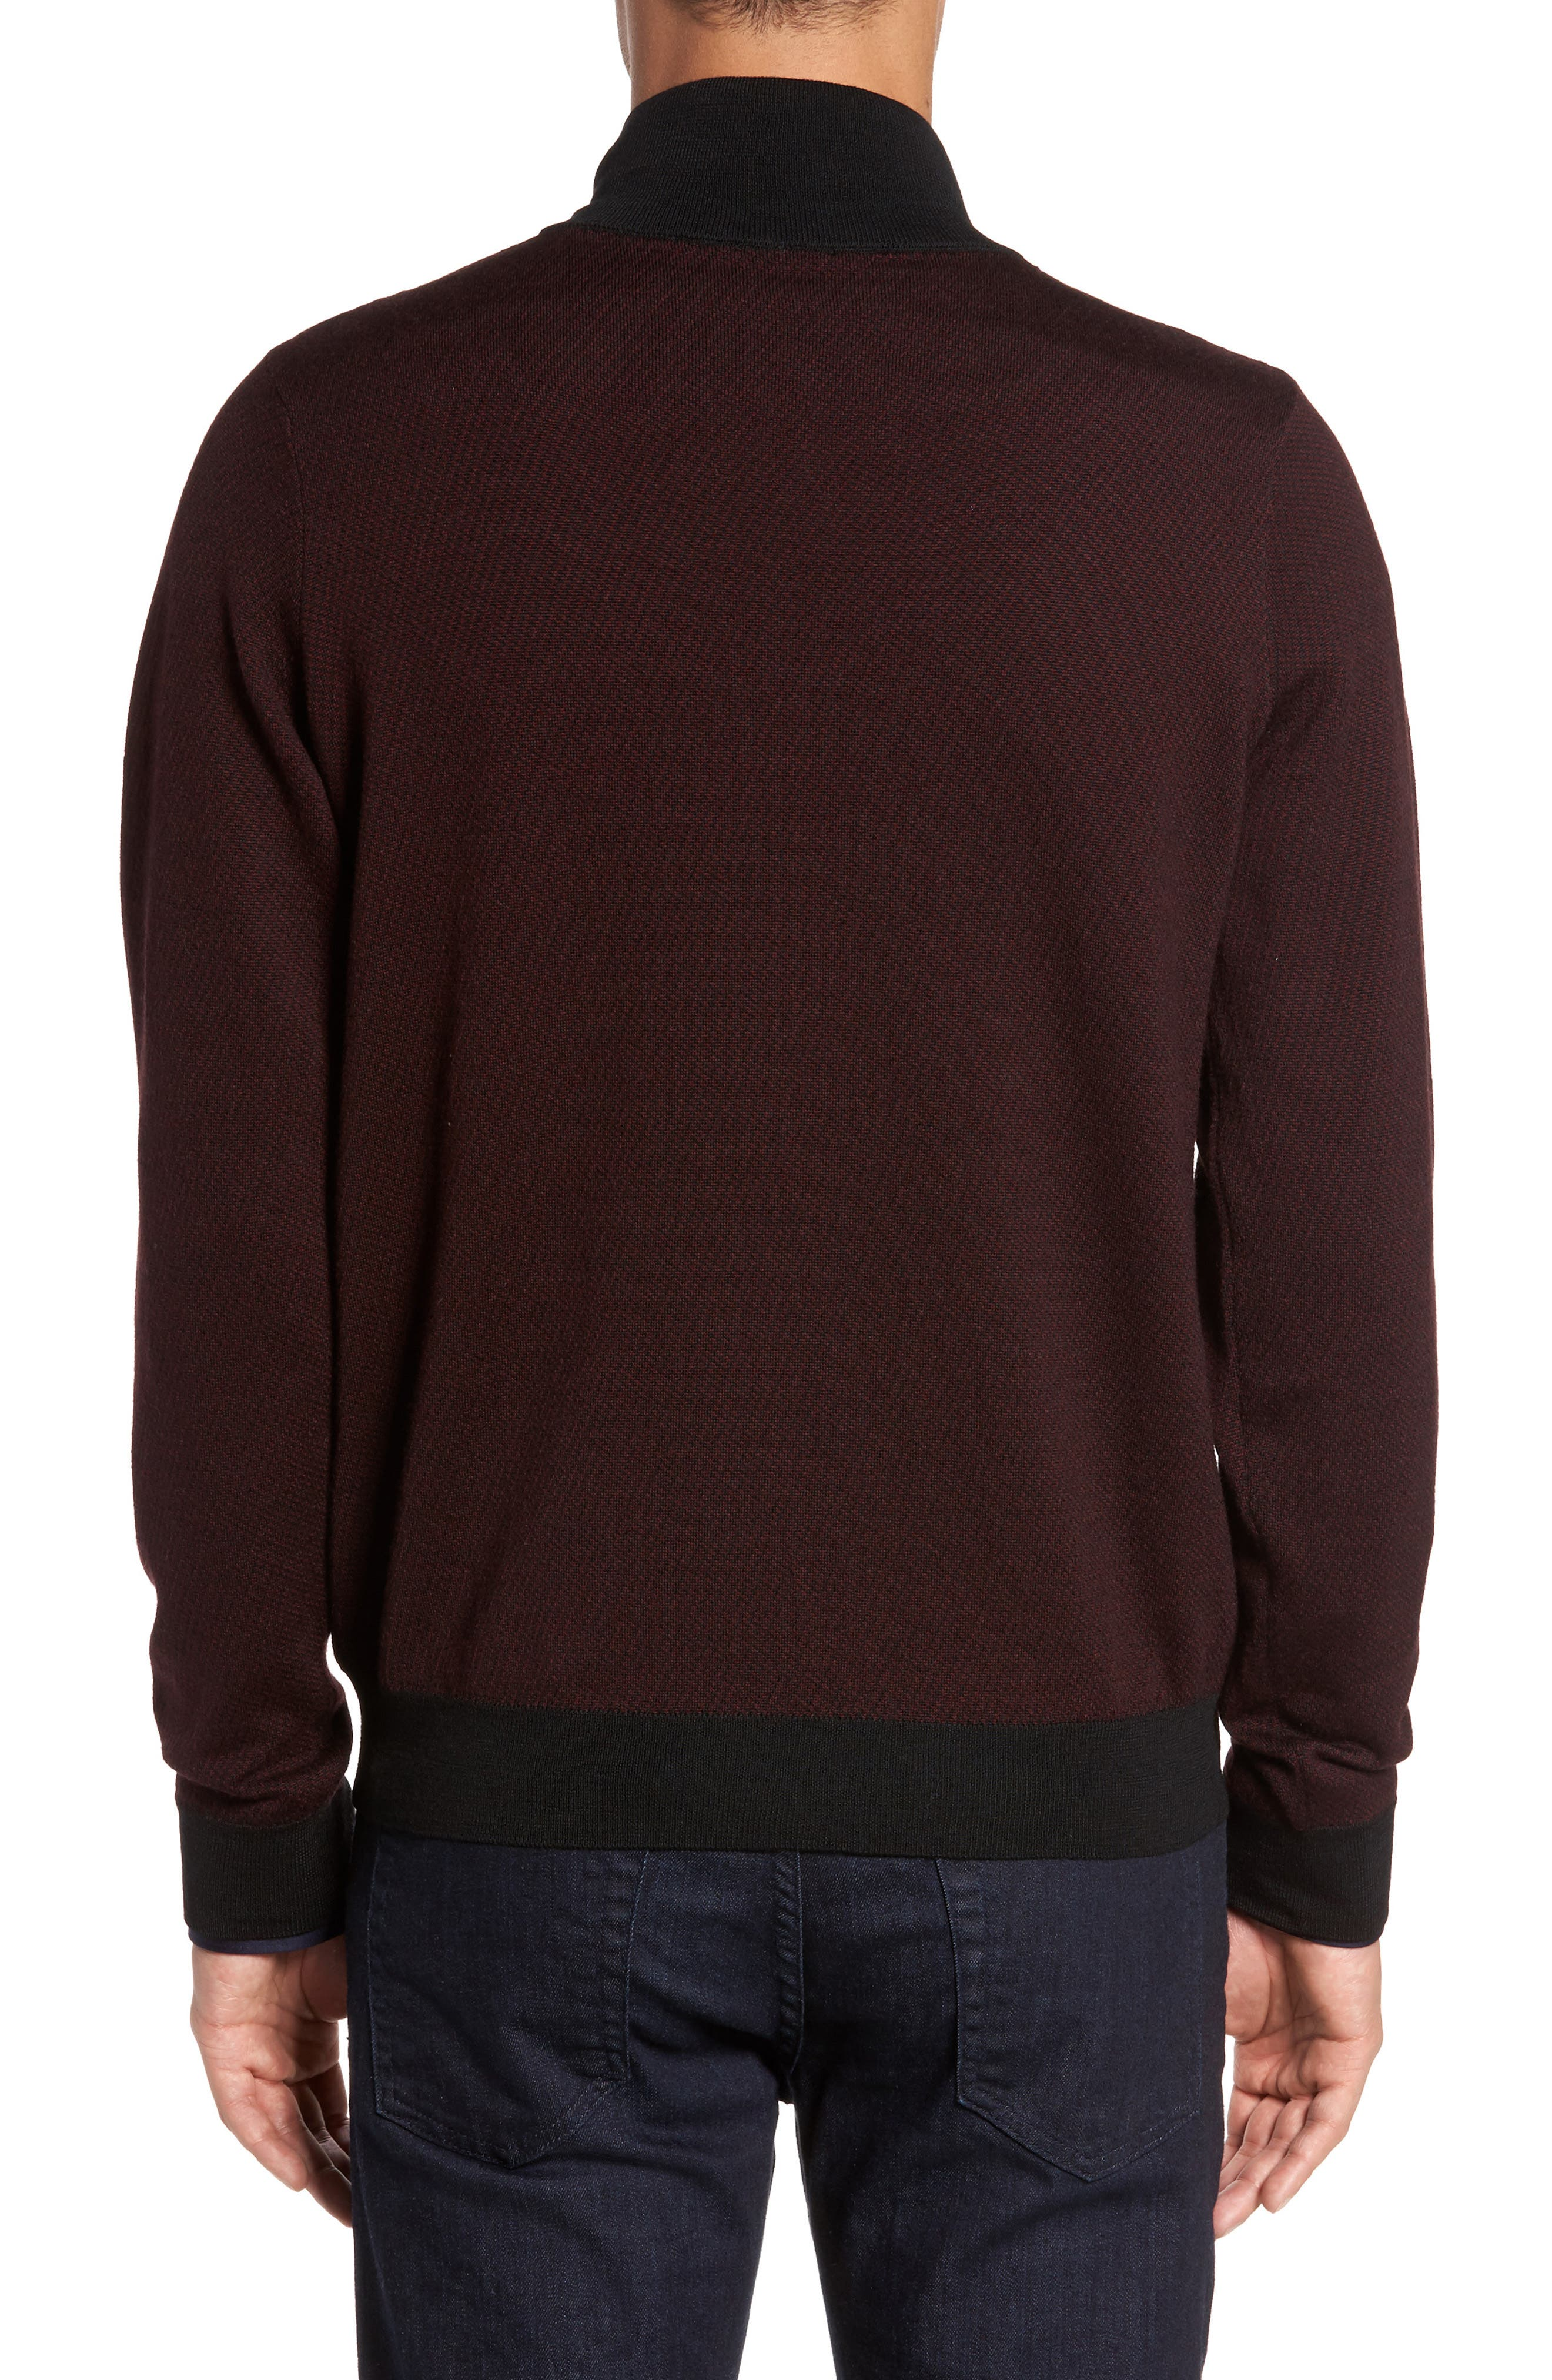 Wool Quarter Zip Mock Neck Sweater,                             Alternate thumbnail 2, color,                             Burgundy